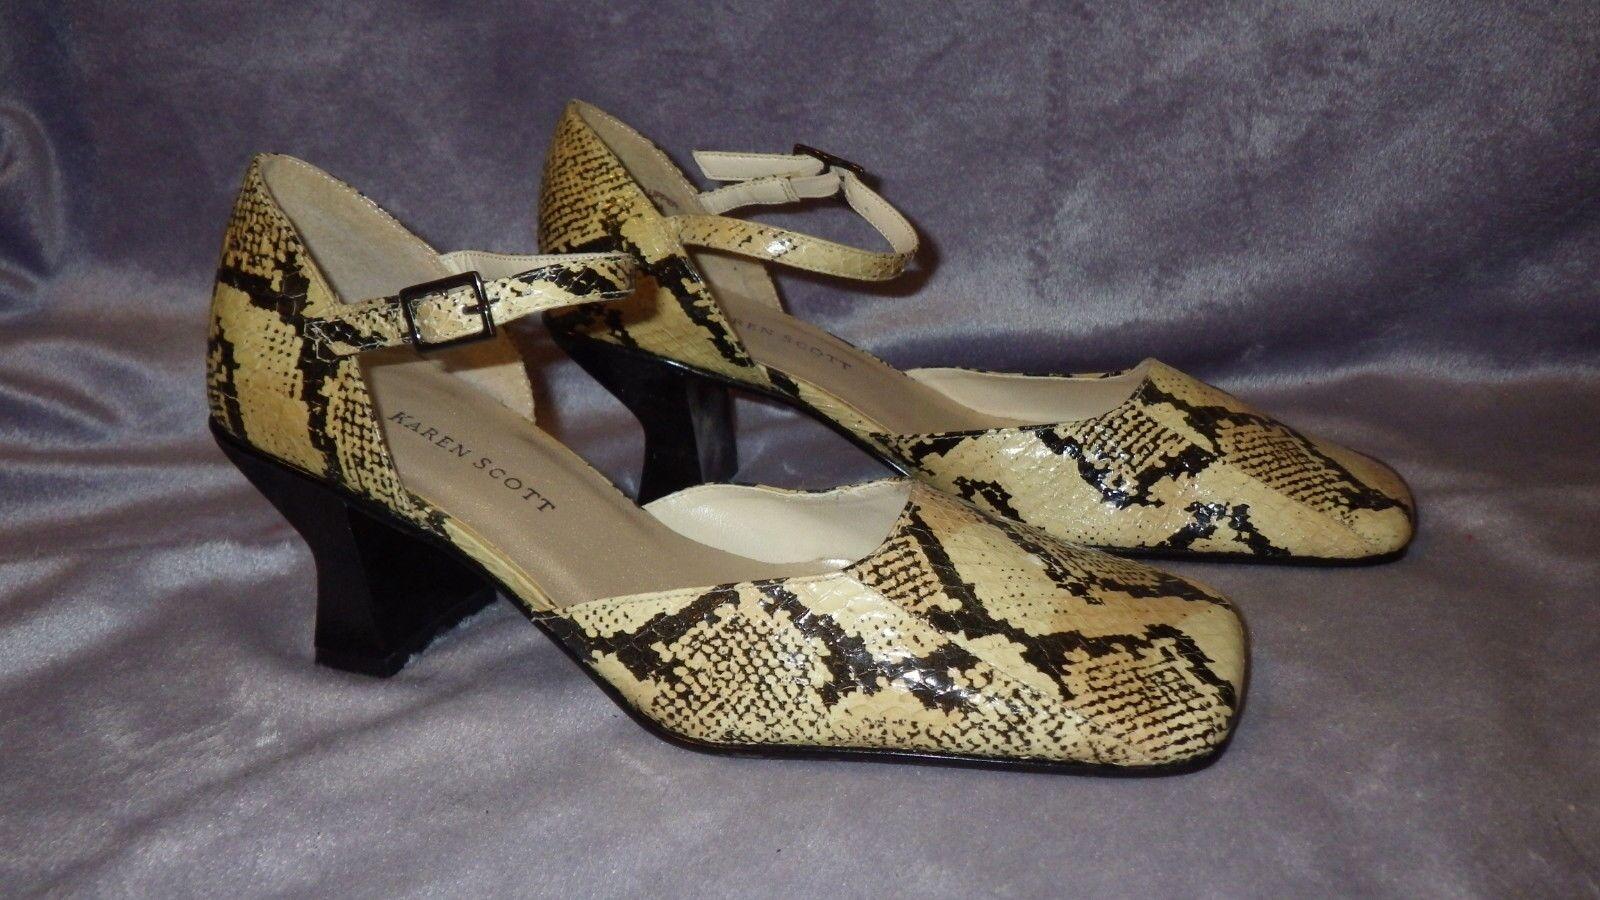 Karen 6.5M Scott Leather Heels Snake Skin Print NWOB 6.5M Karen 2 3/8